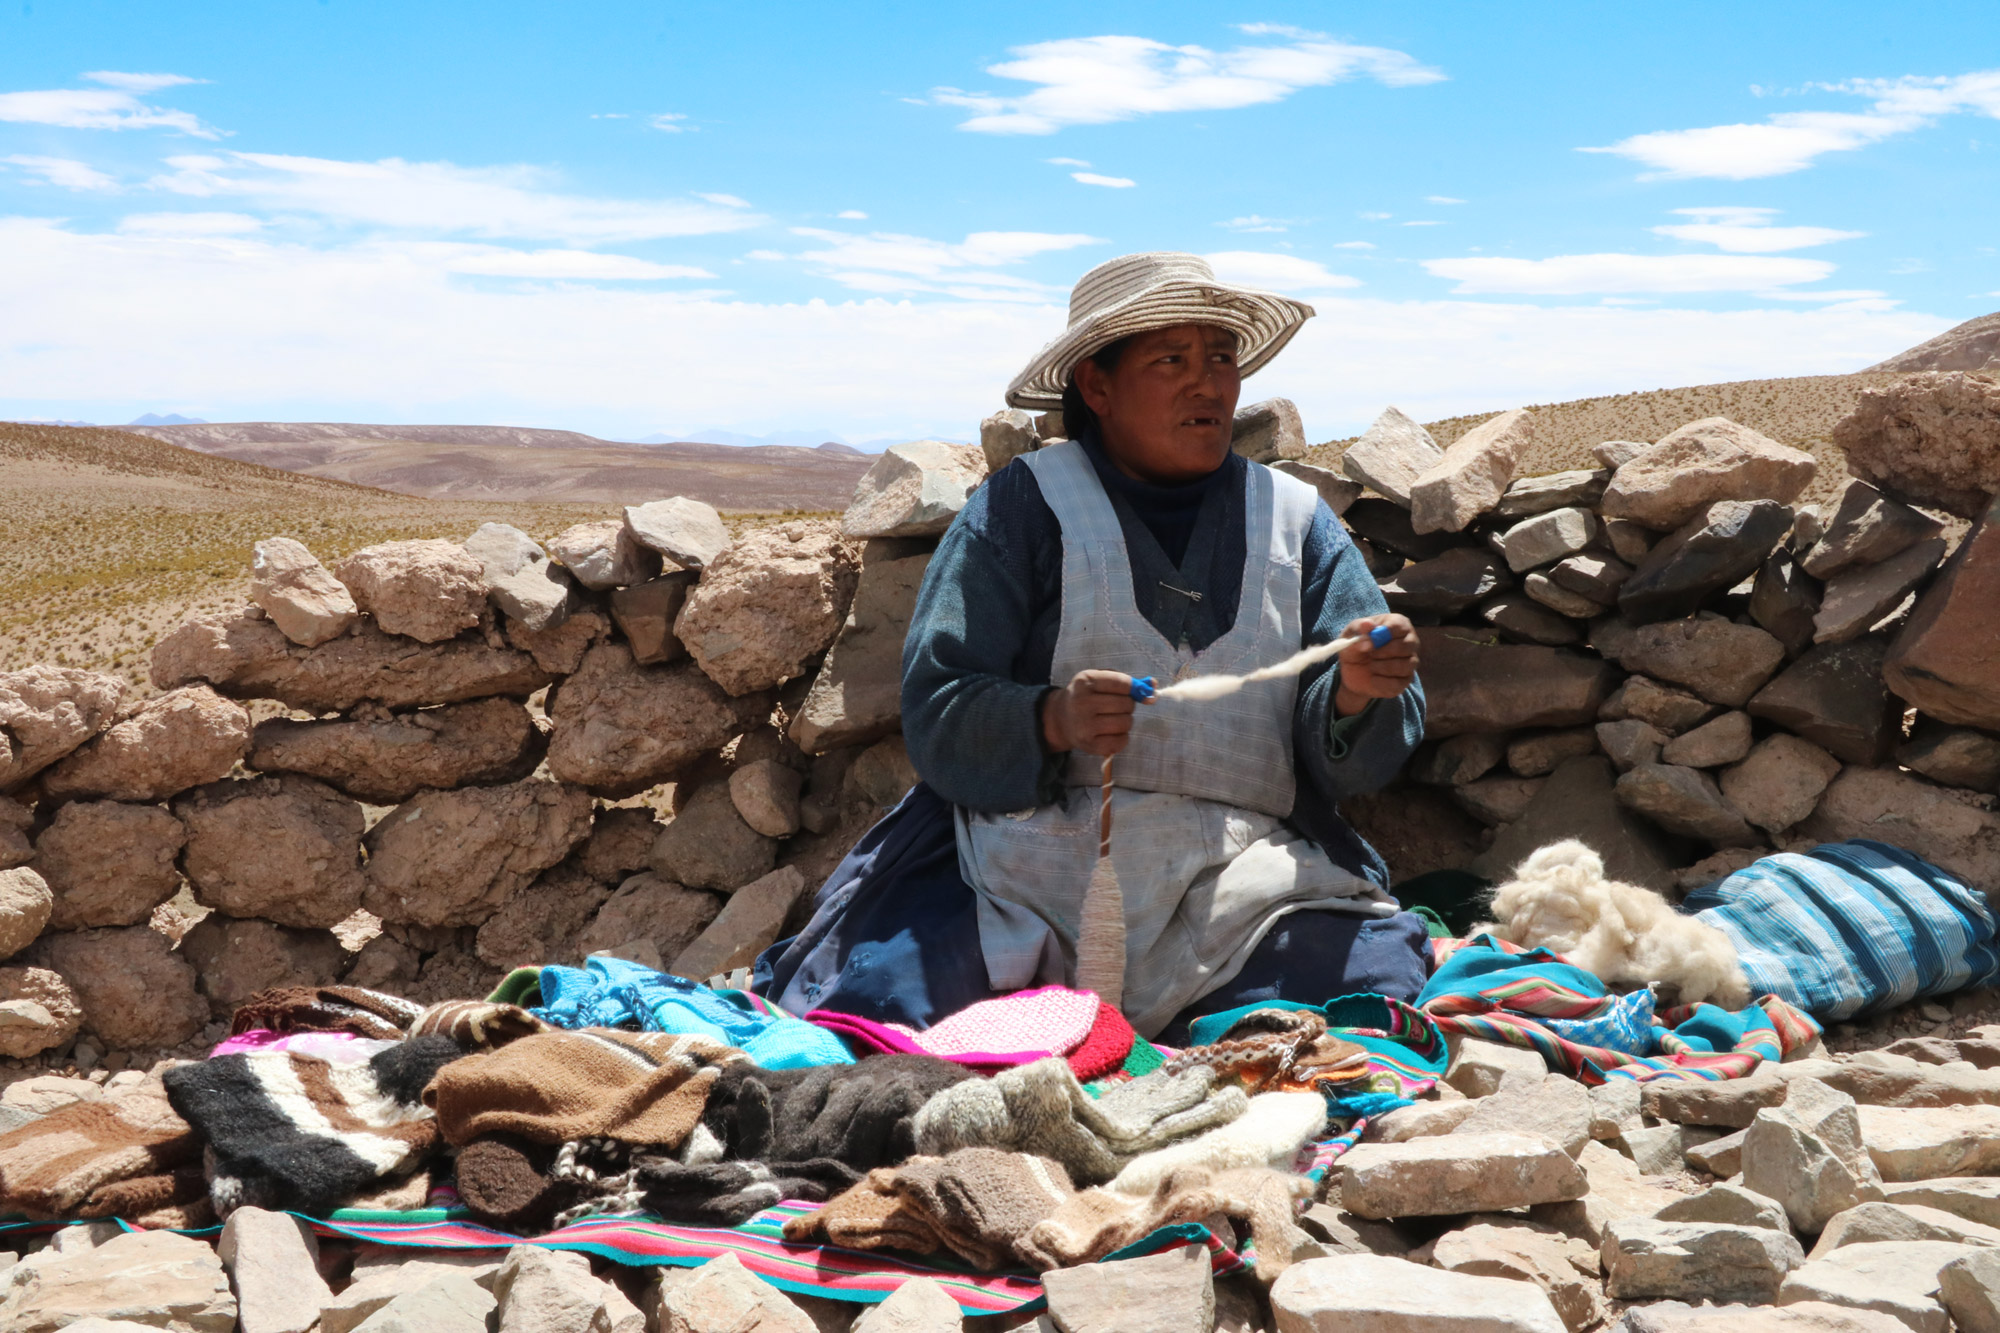 Reisverslag Bolivia: Four Days Of Fantasy Tour - Vrouwen verkopen souvenirs van lamaharen